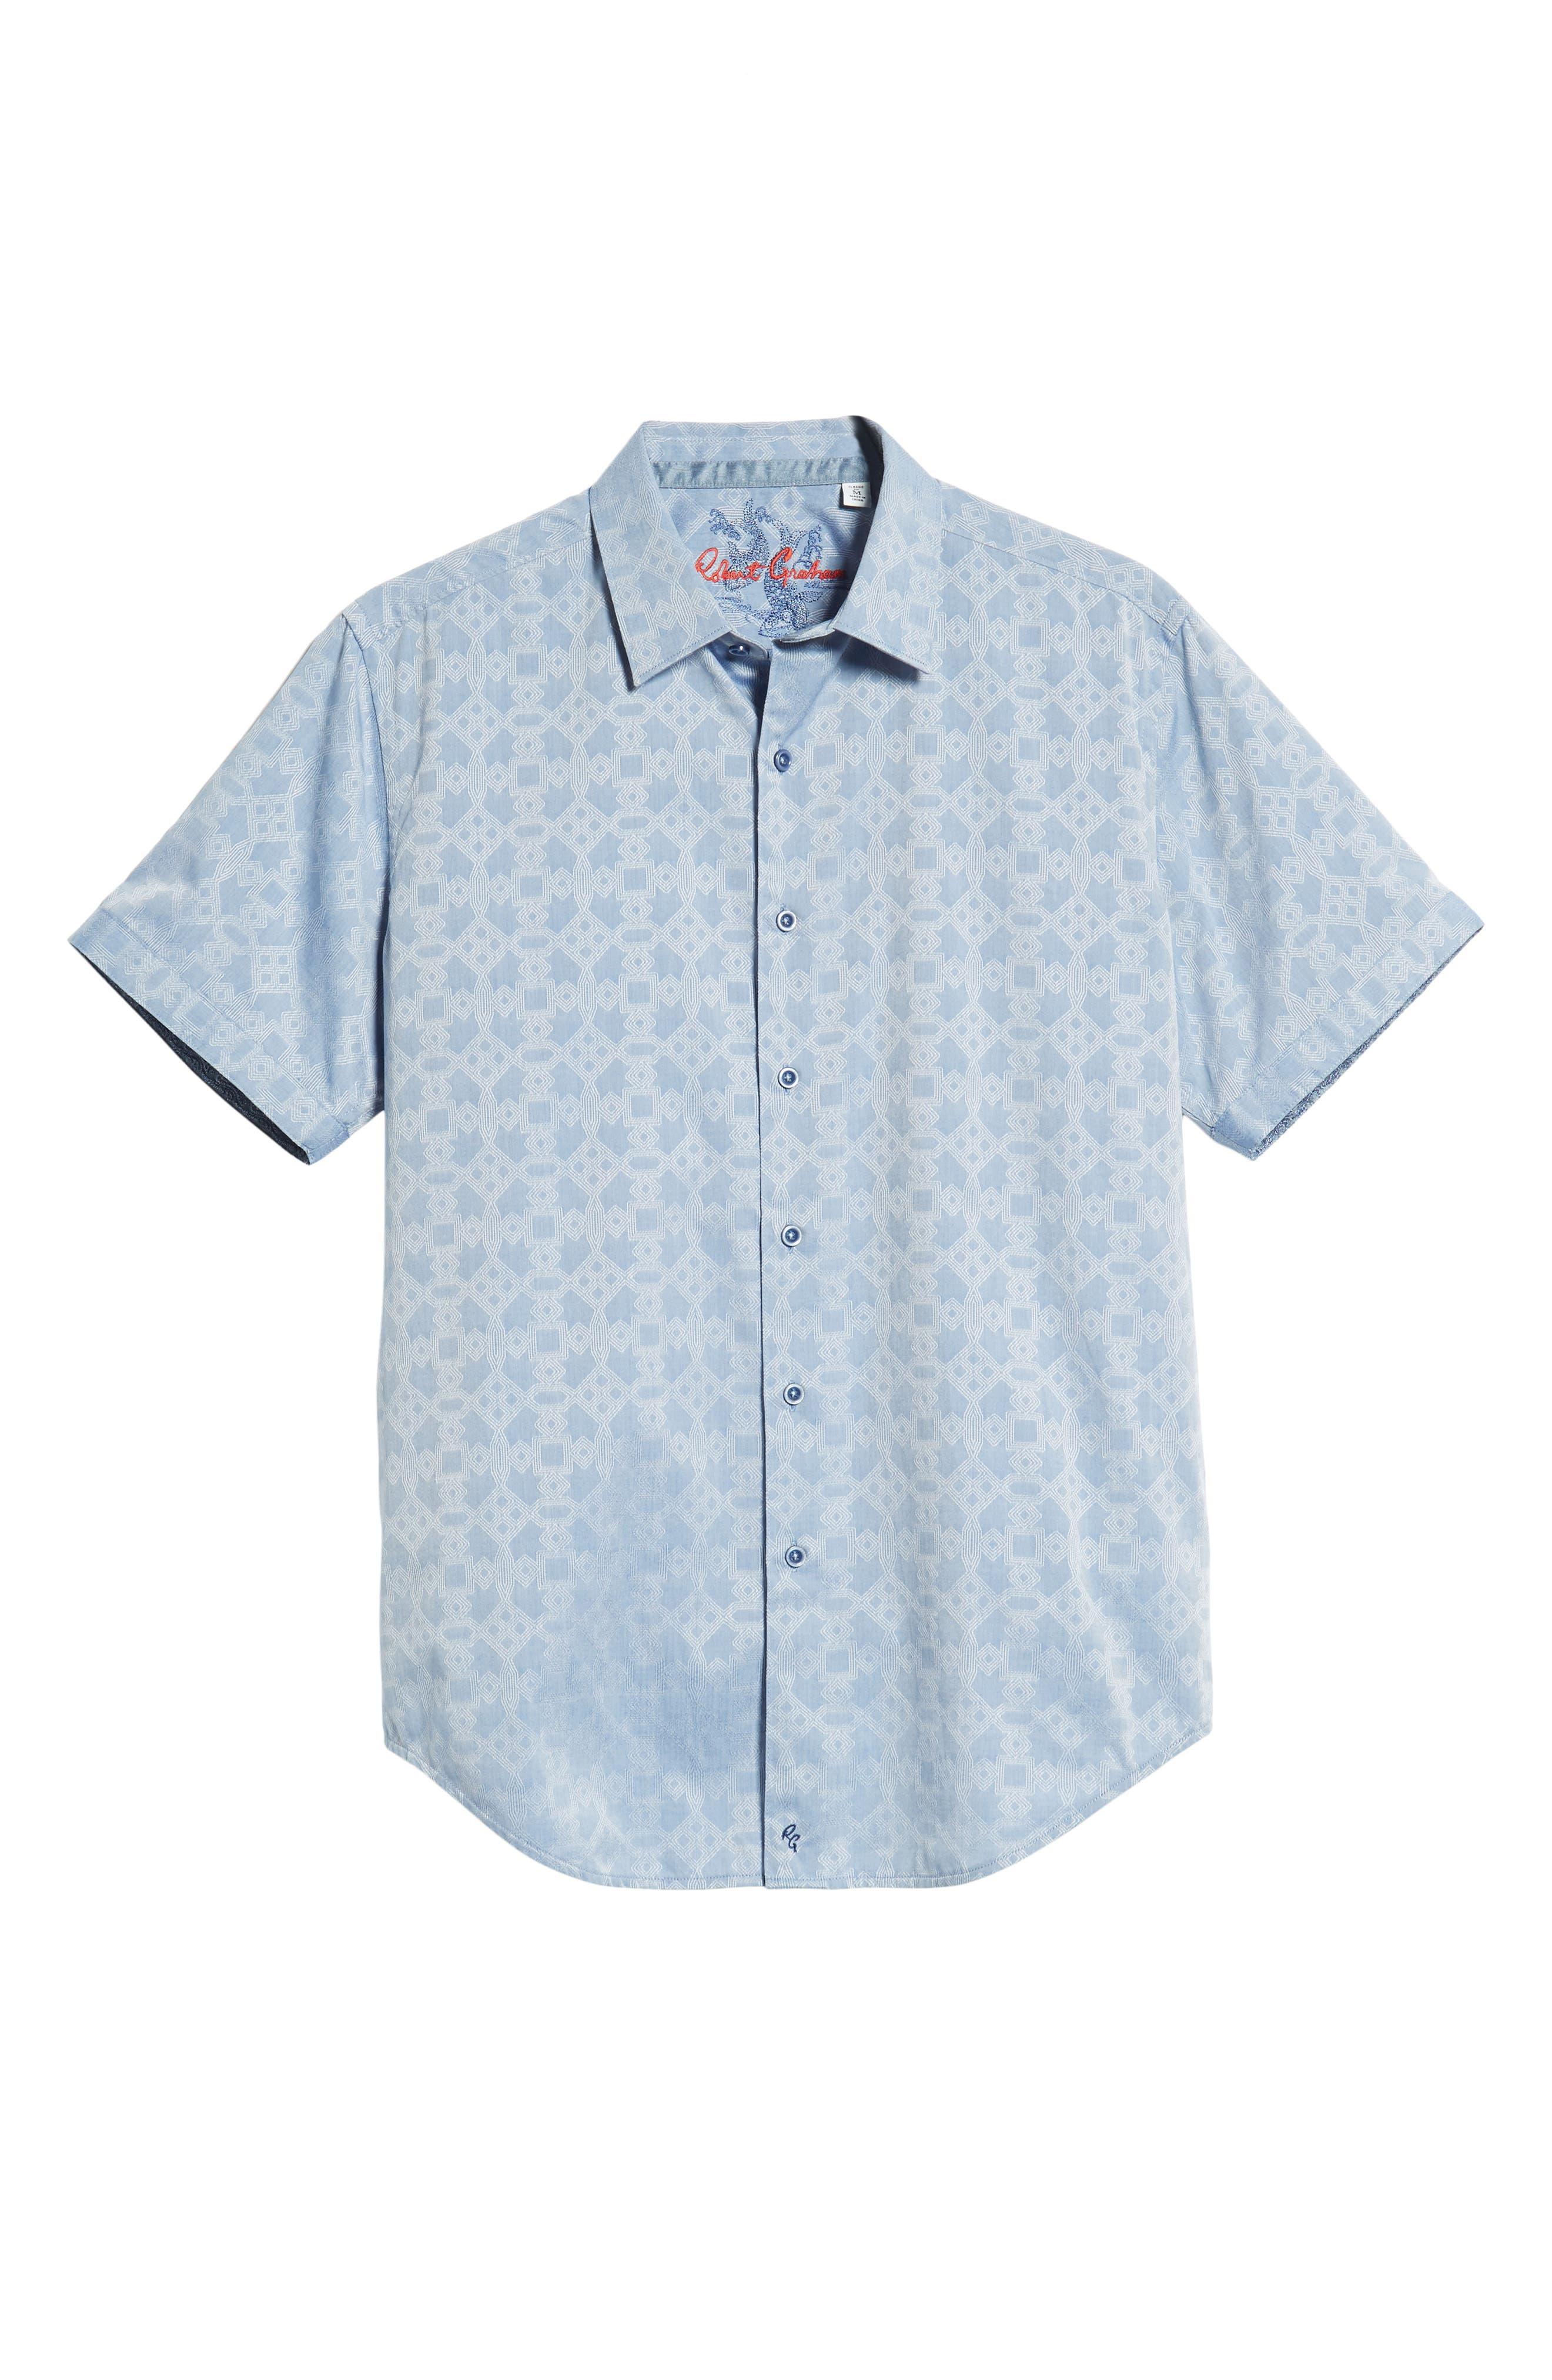 Maya Bay Classic Fit Jacquard Sport Shirt,                         Main,                         color, Blue